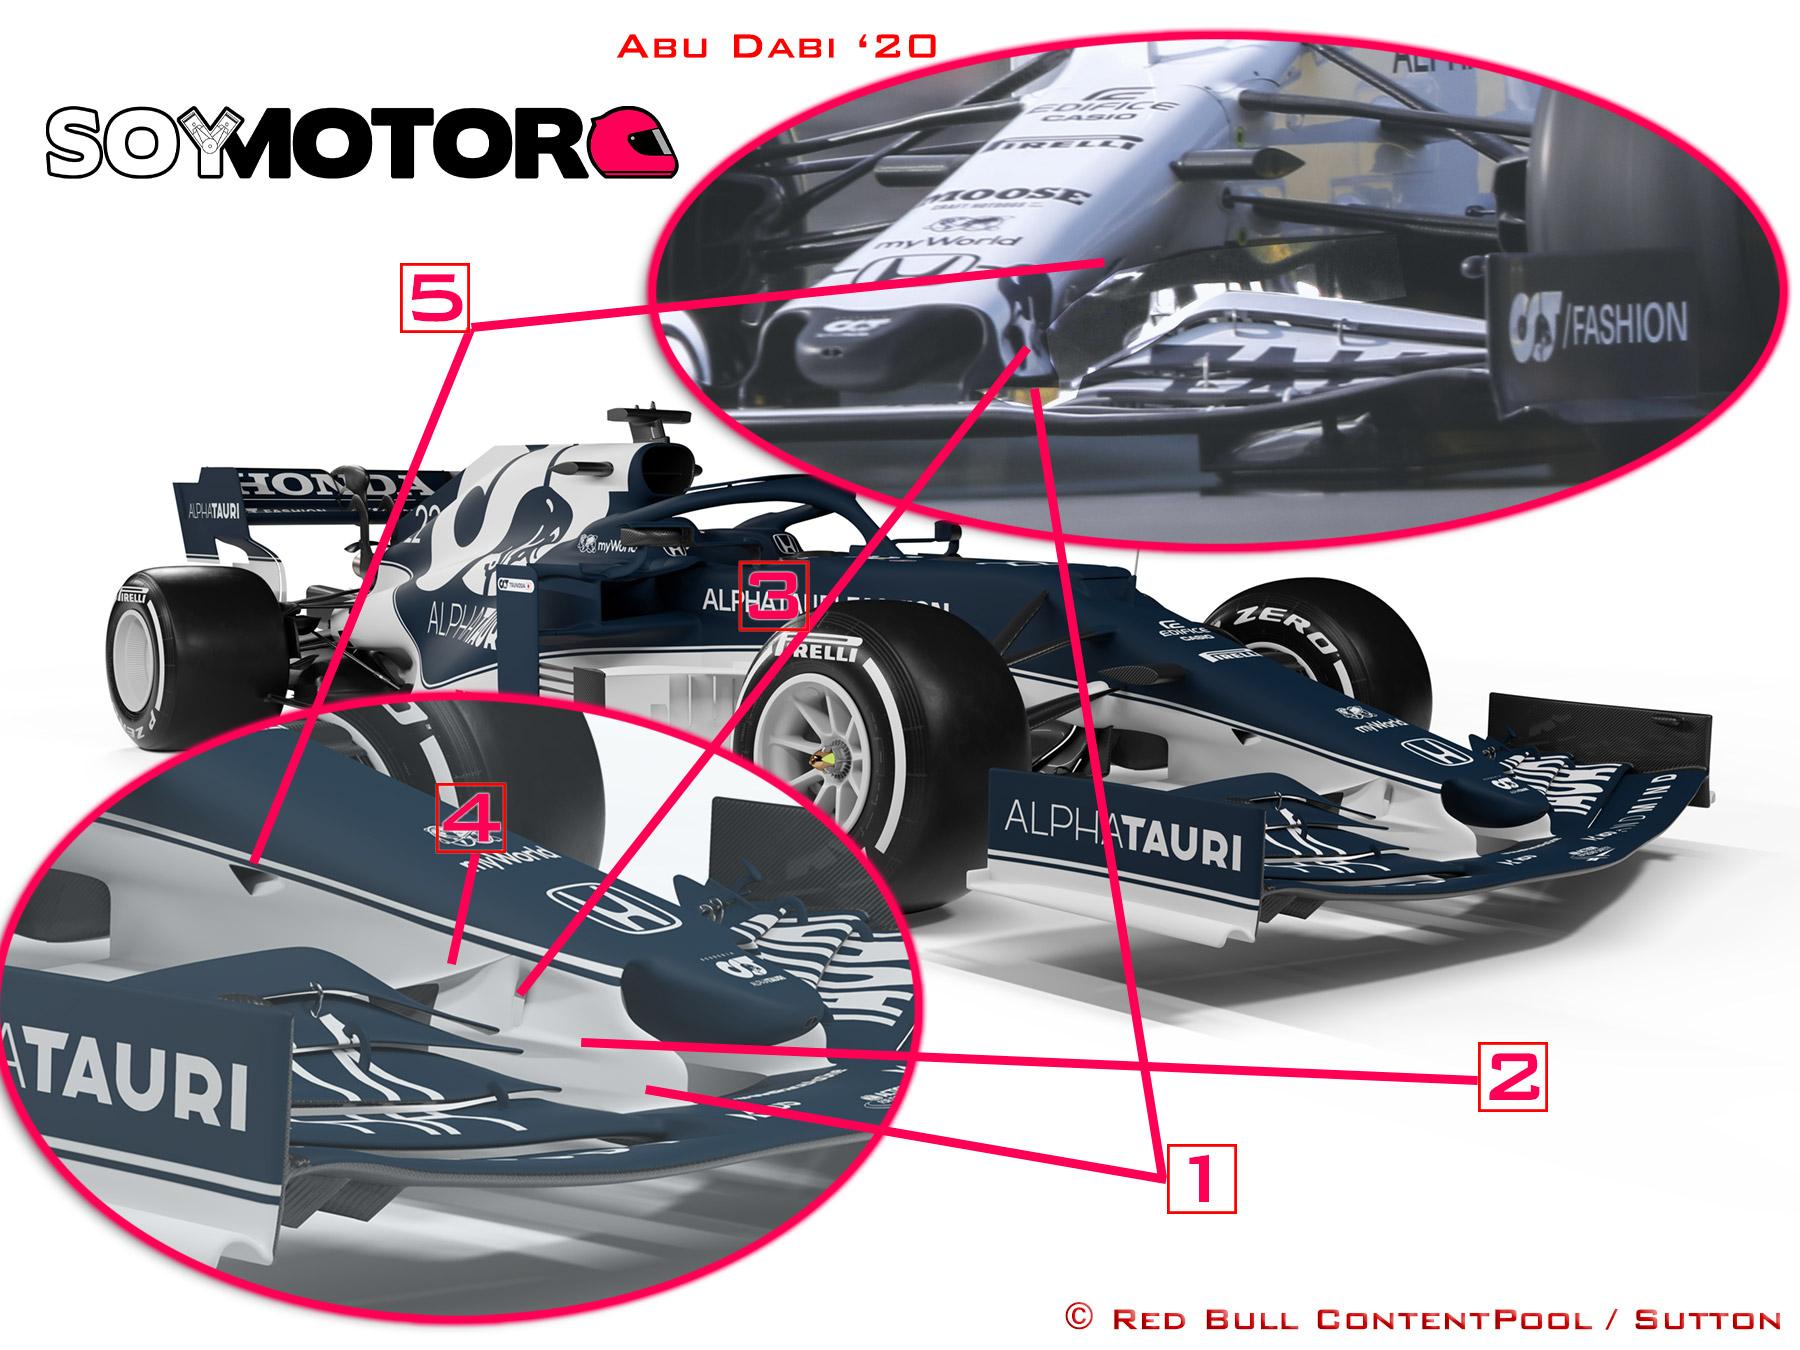 at02-soporte-ala-delantera-soymotor.jpg